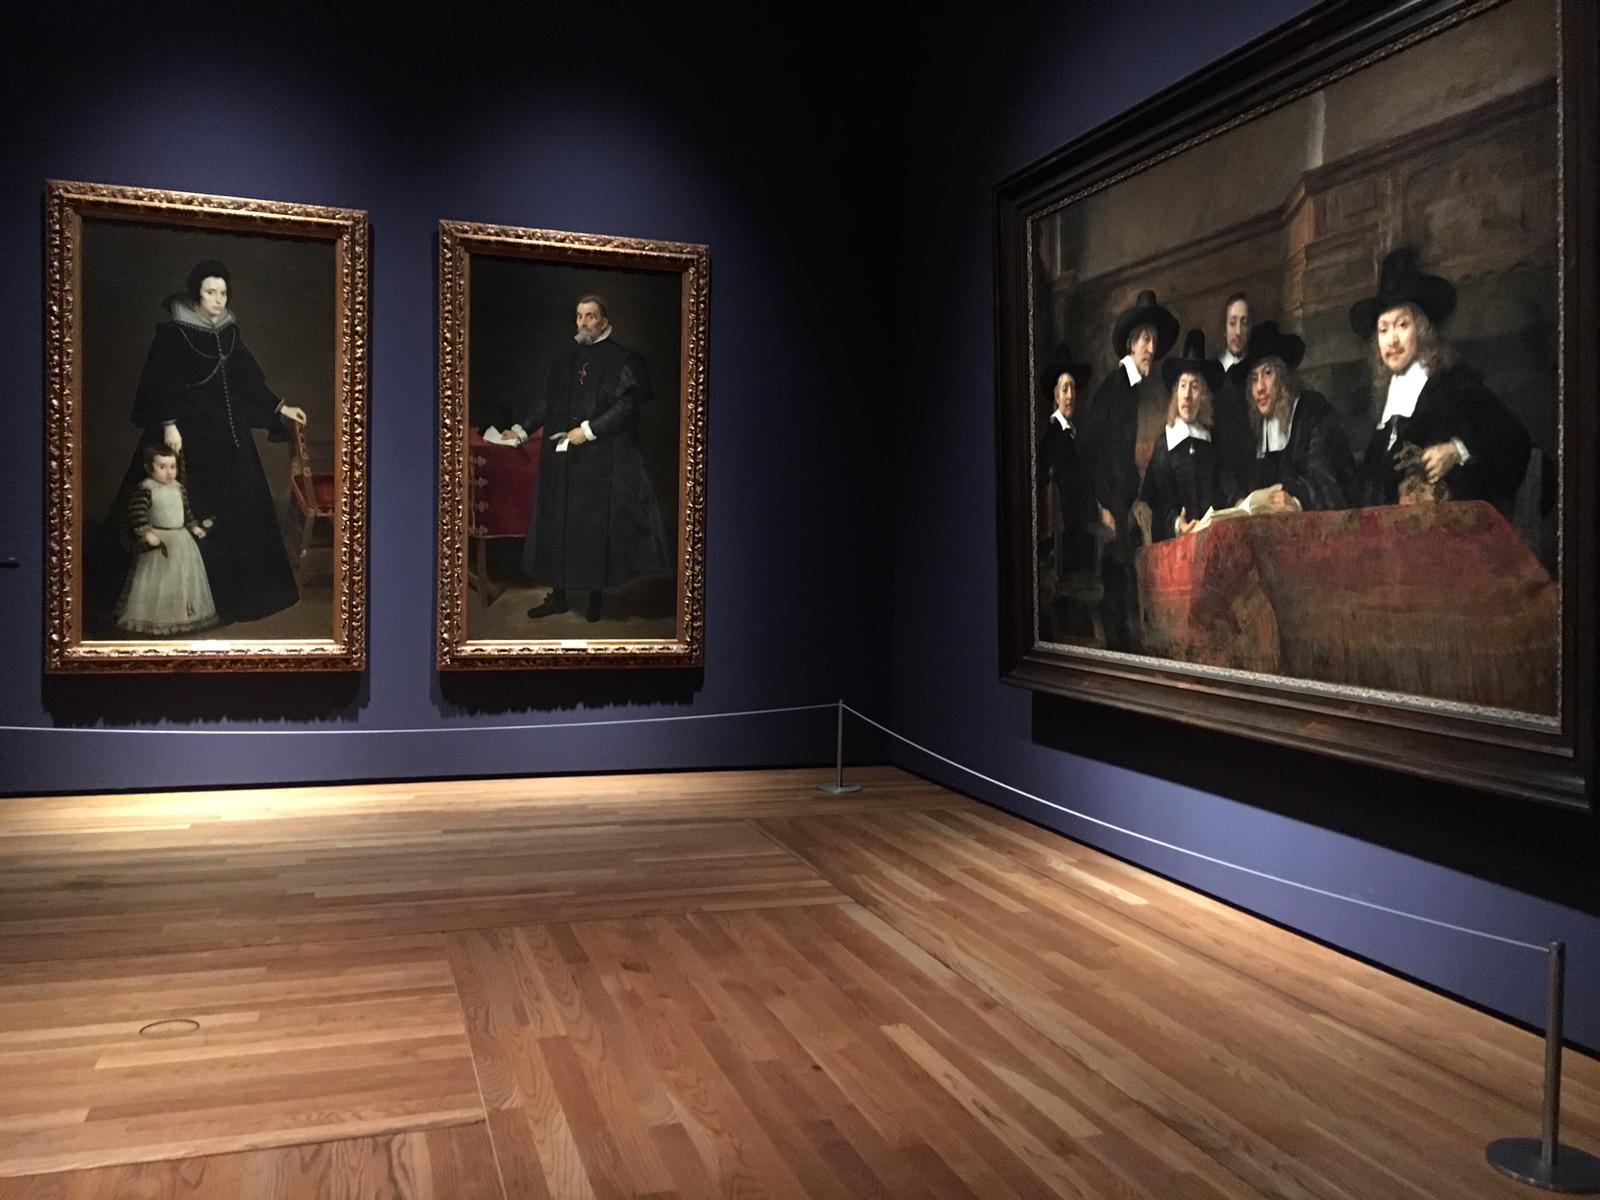 Velázquez, Rembrandt, Vermeer : Parallel Visions in Prado Museum